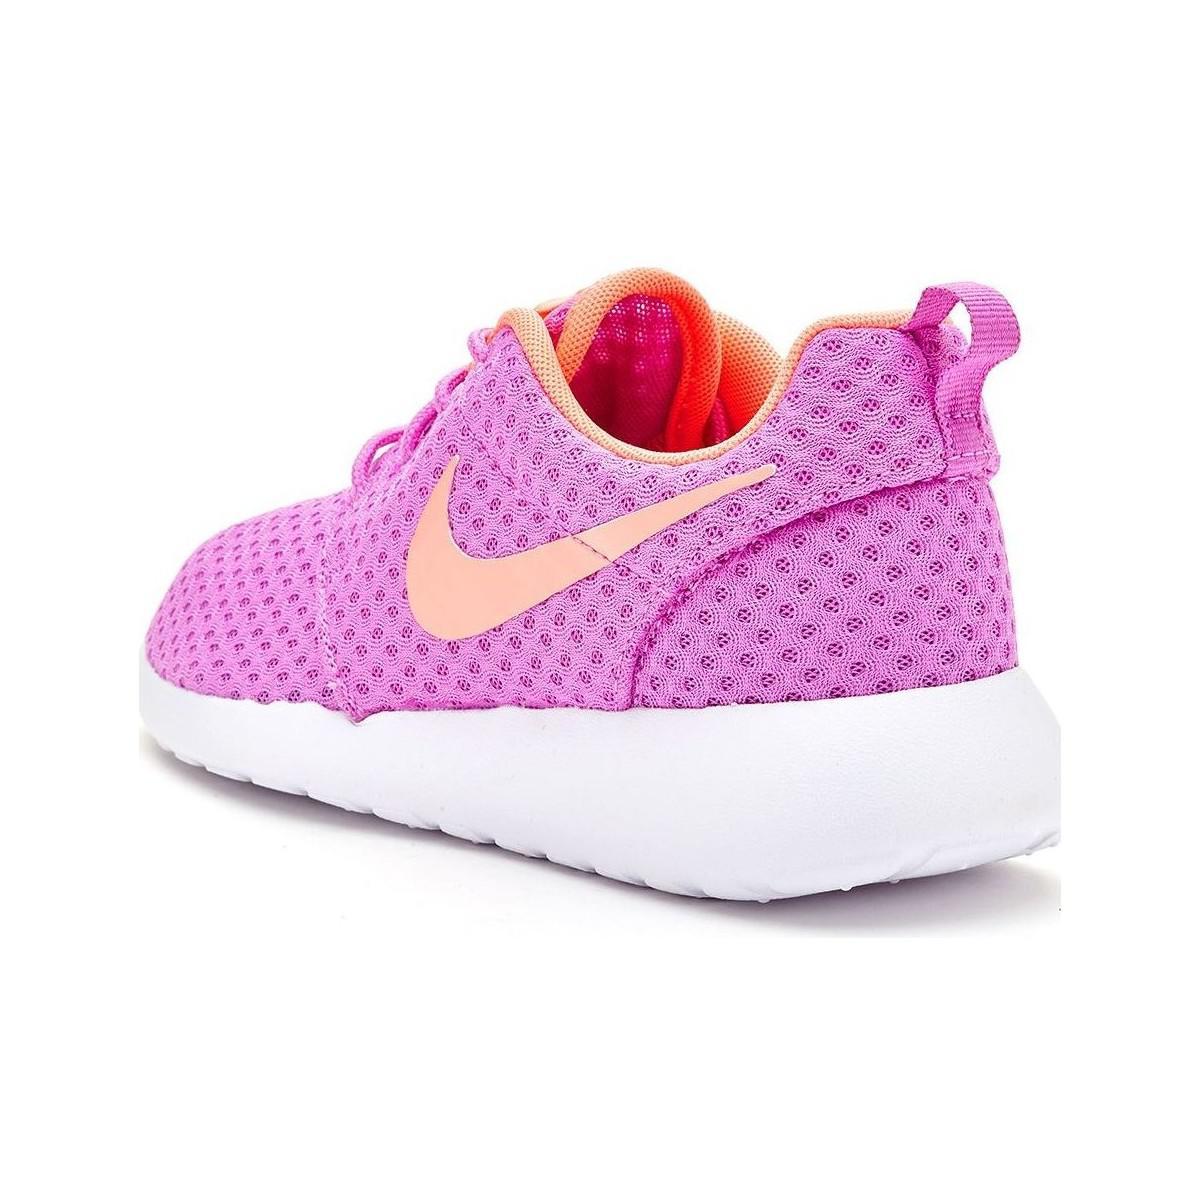 fc4df607a728 Nike Roshe Run One Br Women Trainers In Fuchsia Glow Lava Glow 724 ...